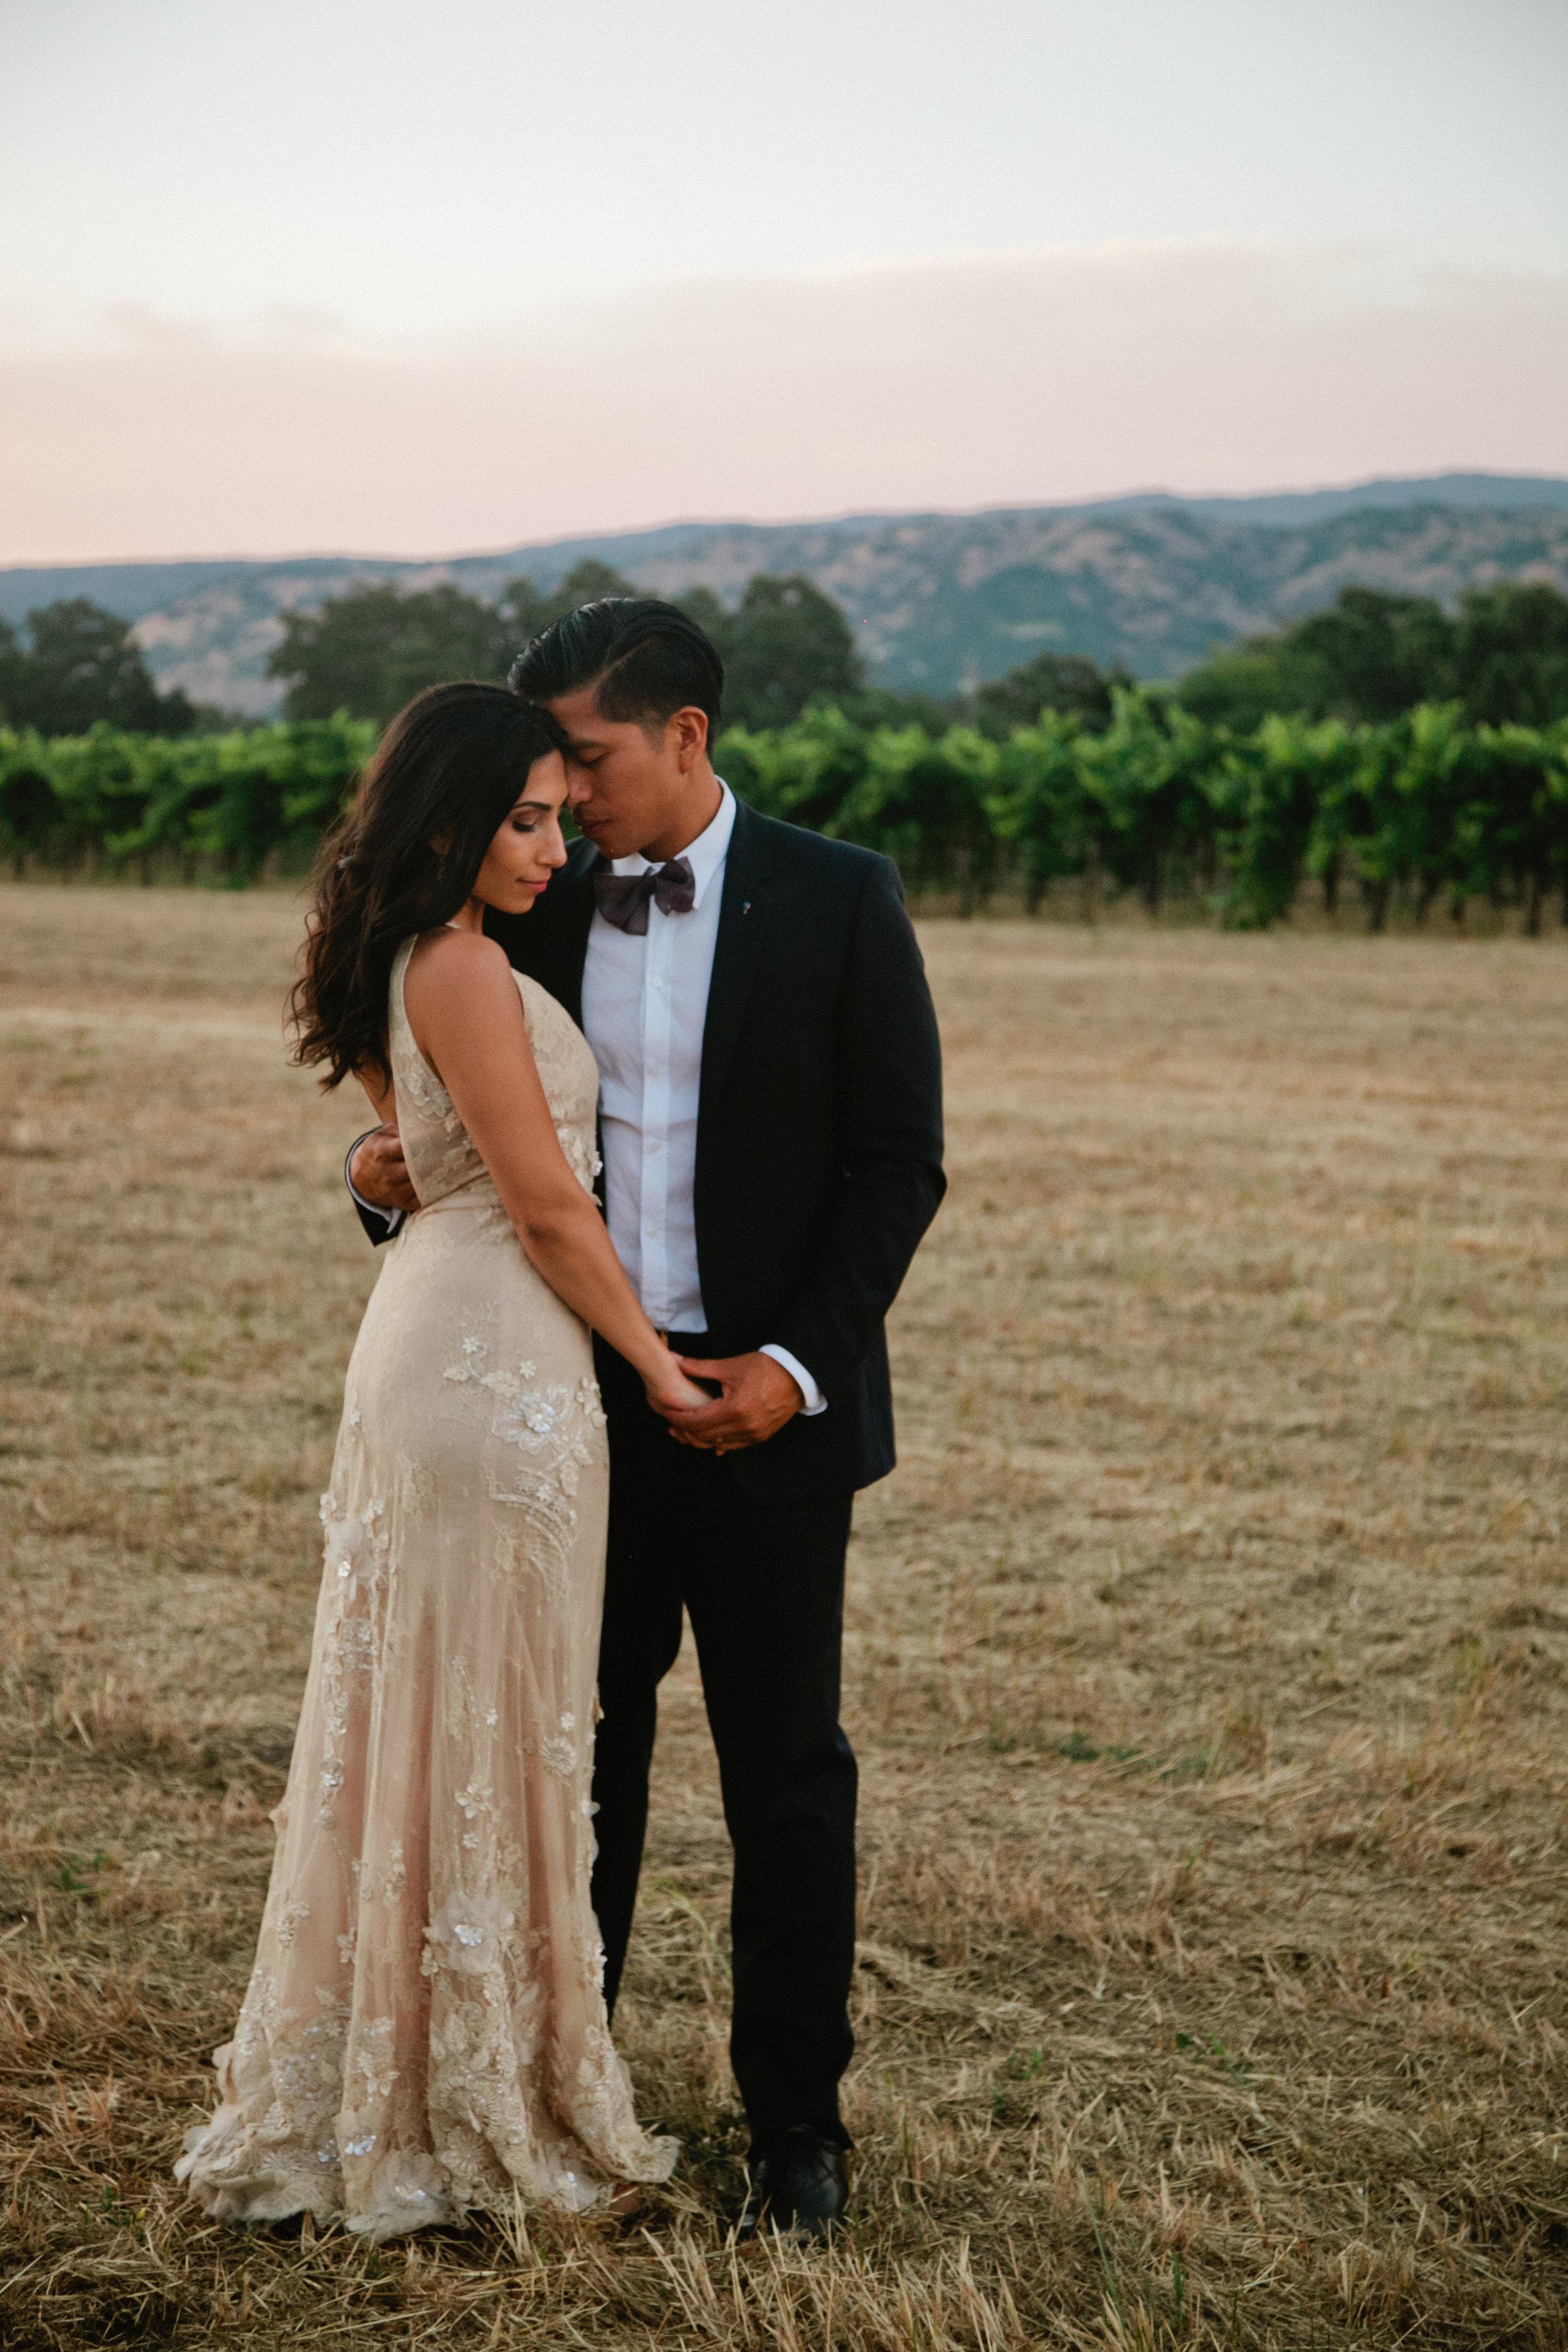 California Wedding Photographer Elopement Travel Destination Napa Valley Elope Couple Photography Lifestyle Candid Artistic Creative Bohemian Romantic Vineyard Inspiration